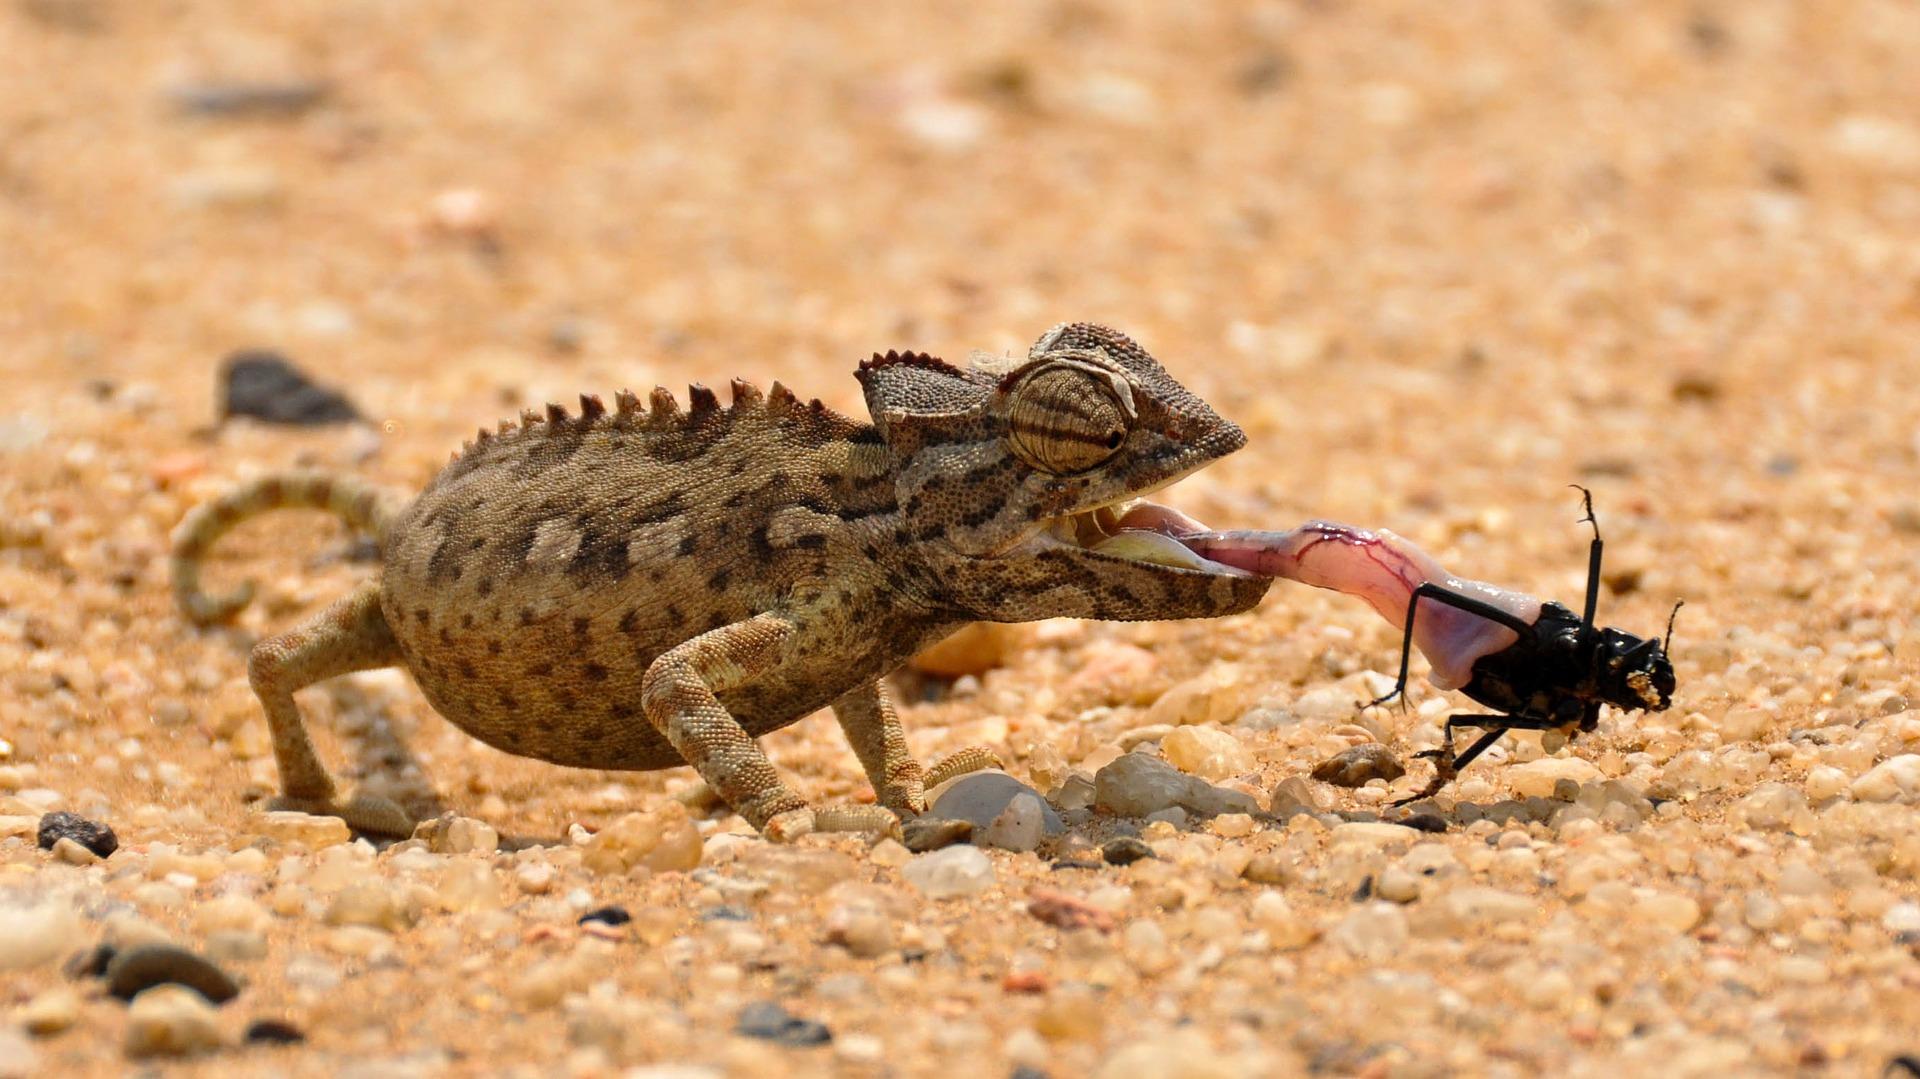 Un caméléon attrape un insecte.